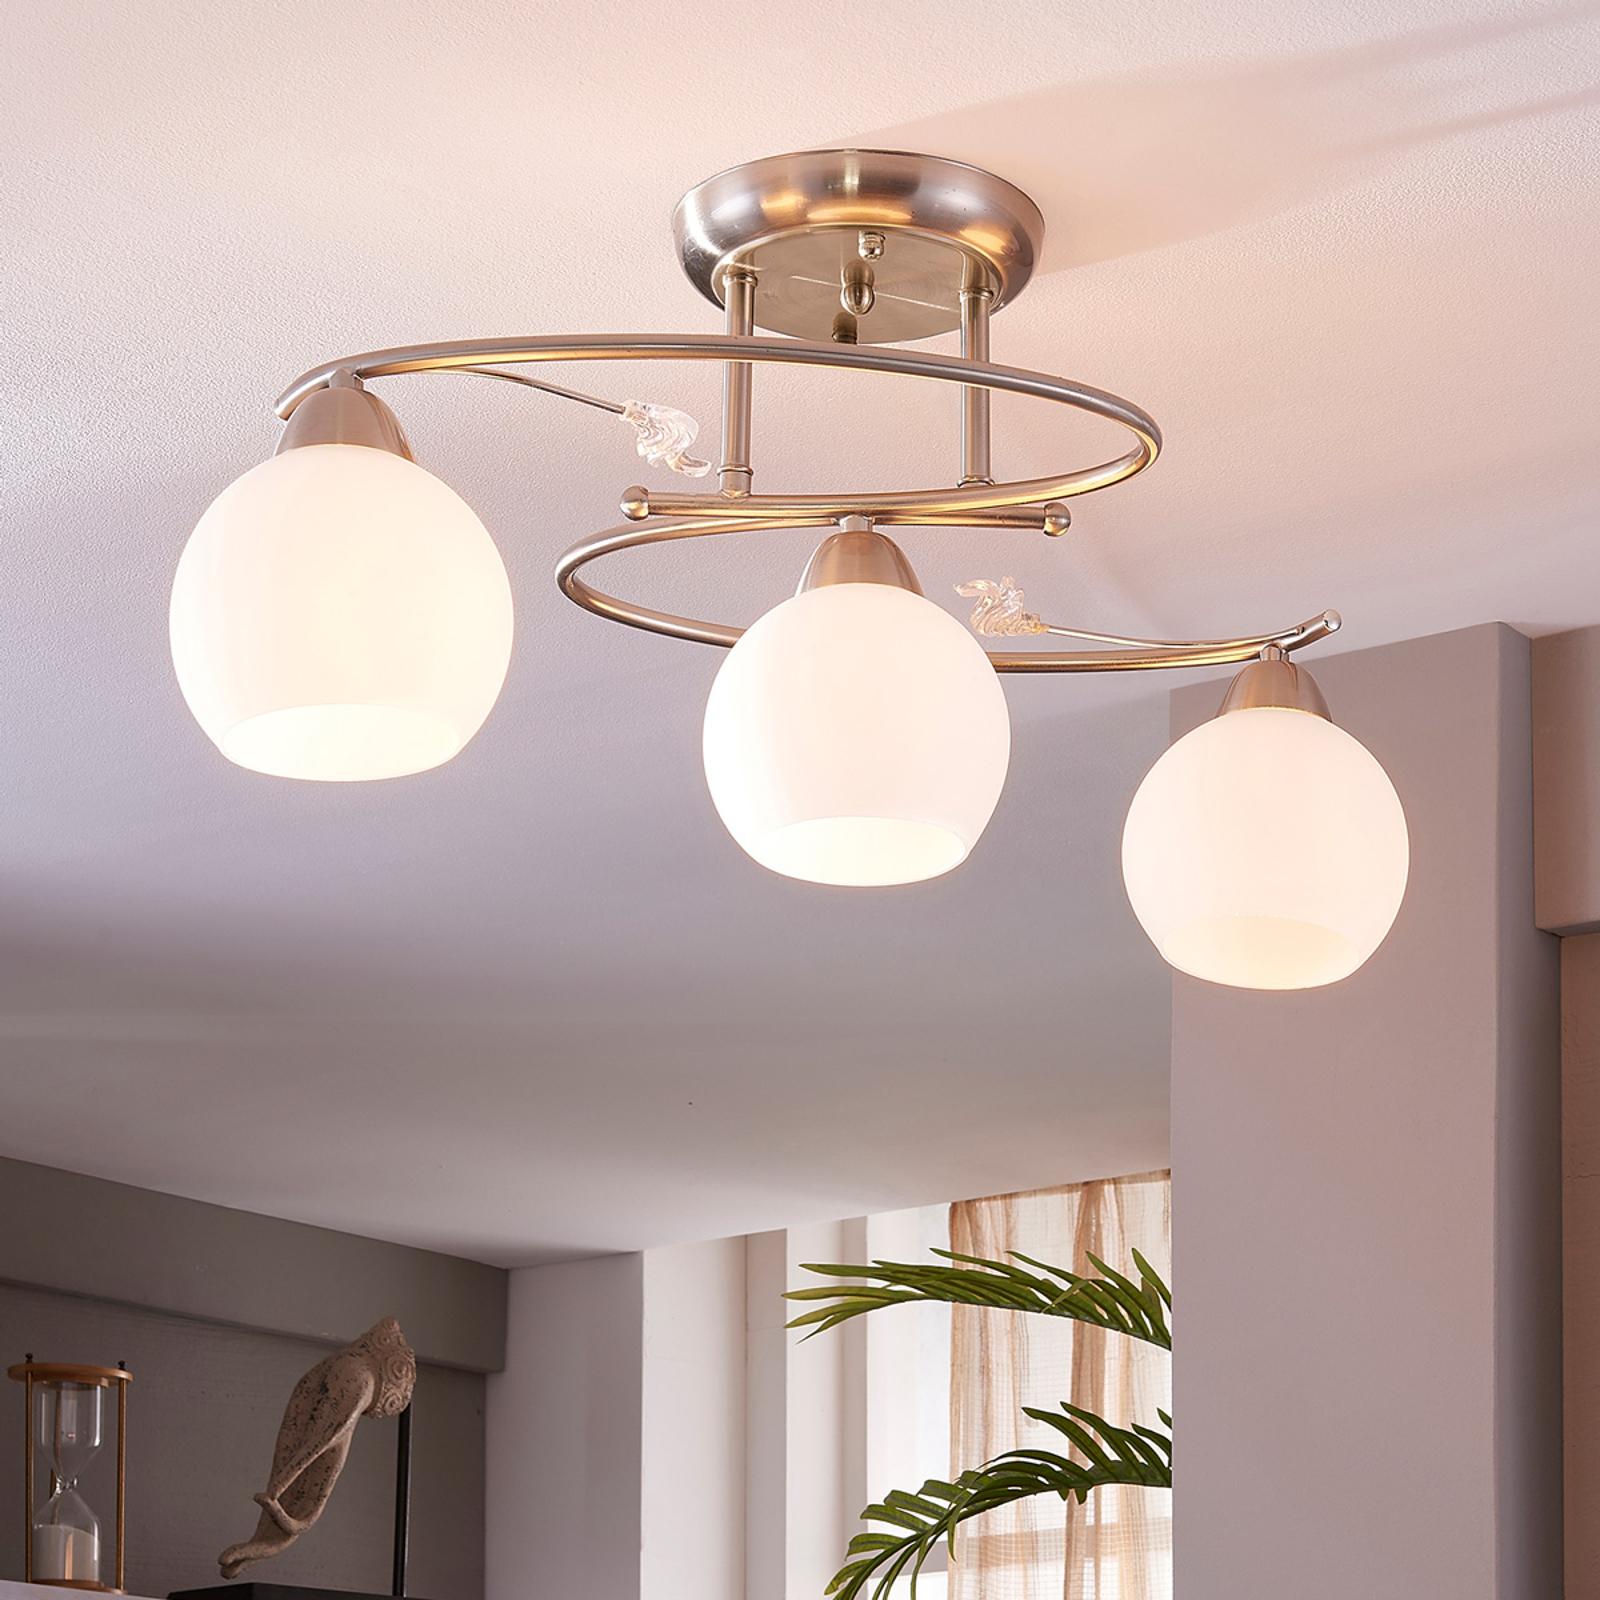 Svean - drielamps plafondlamp